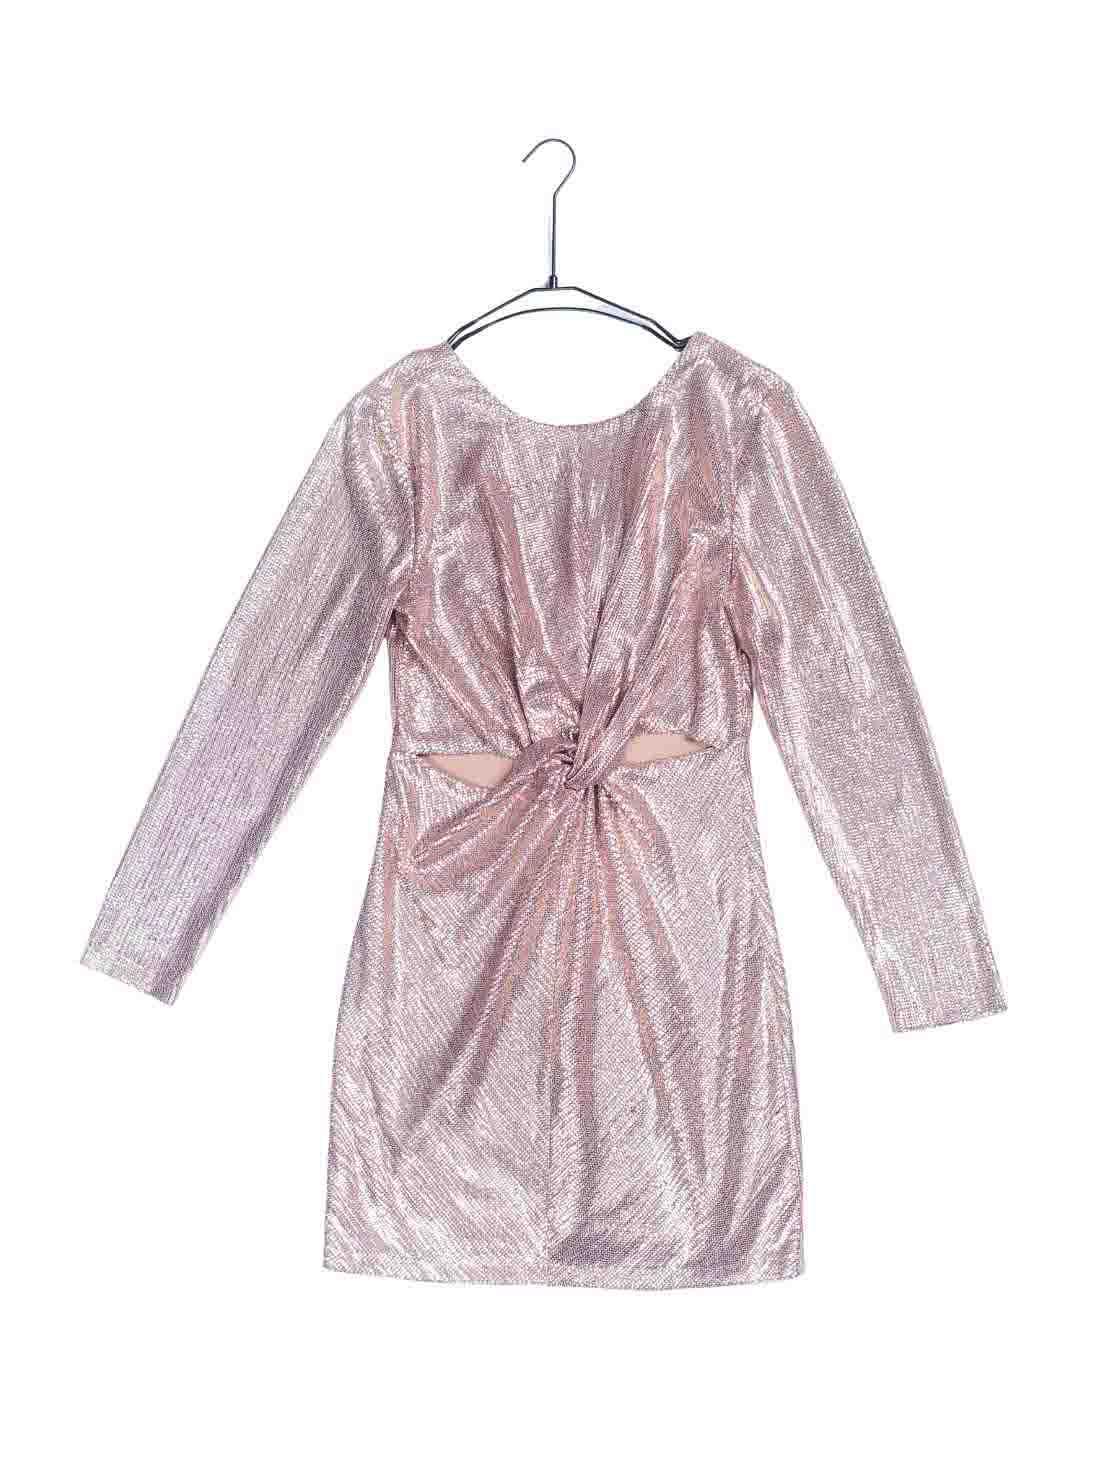 Long Sleeves Blingbling Sequins Dress